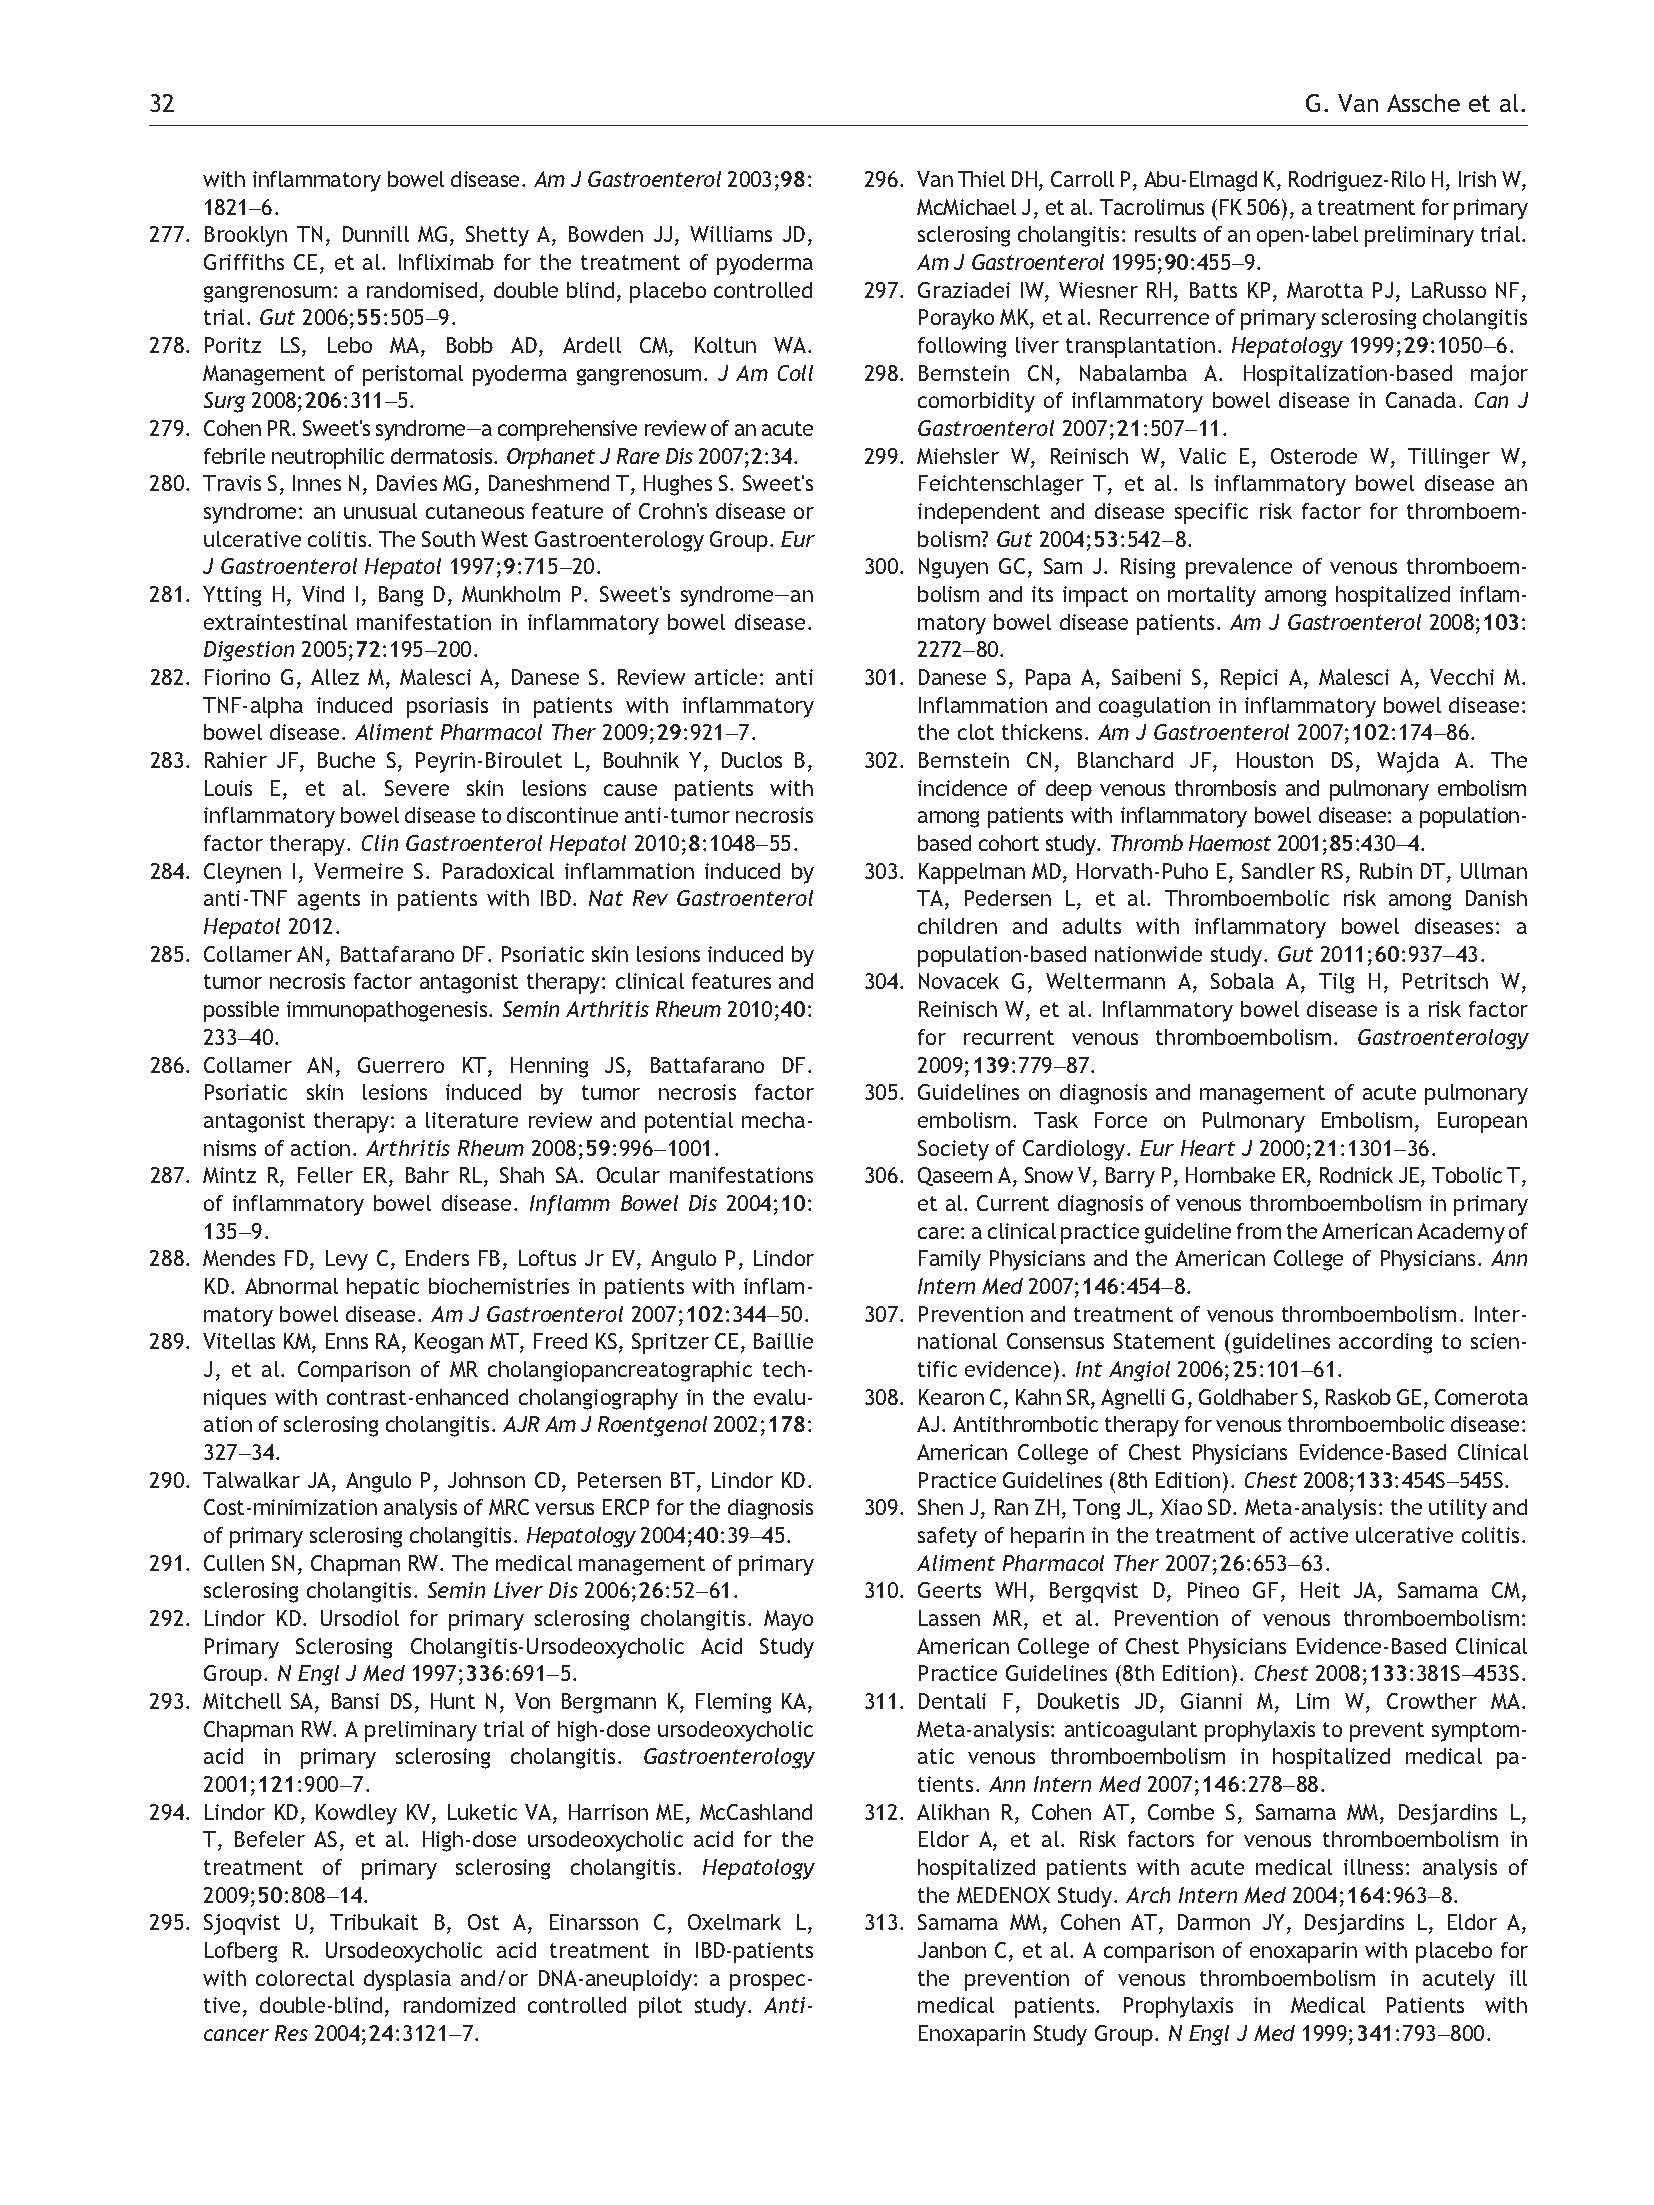 2012-ECCO第二版-欧洲询证共识:溃疡性结肠炎的诊断和处理—特殊情况_页面_32.jpg